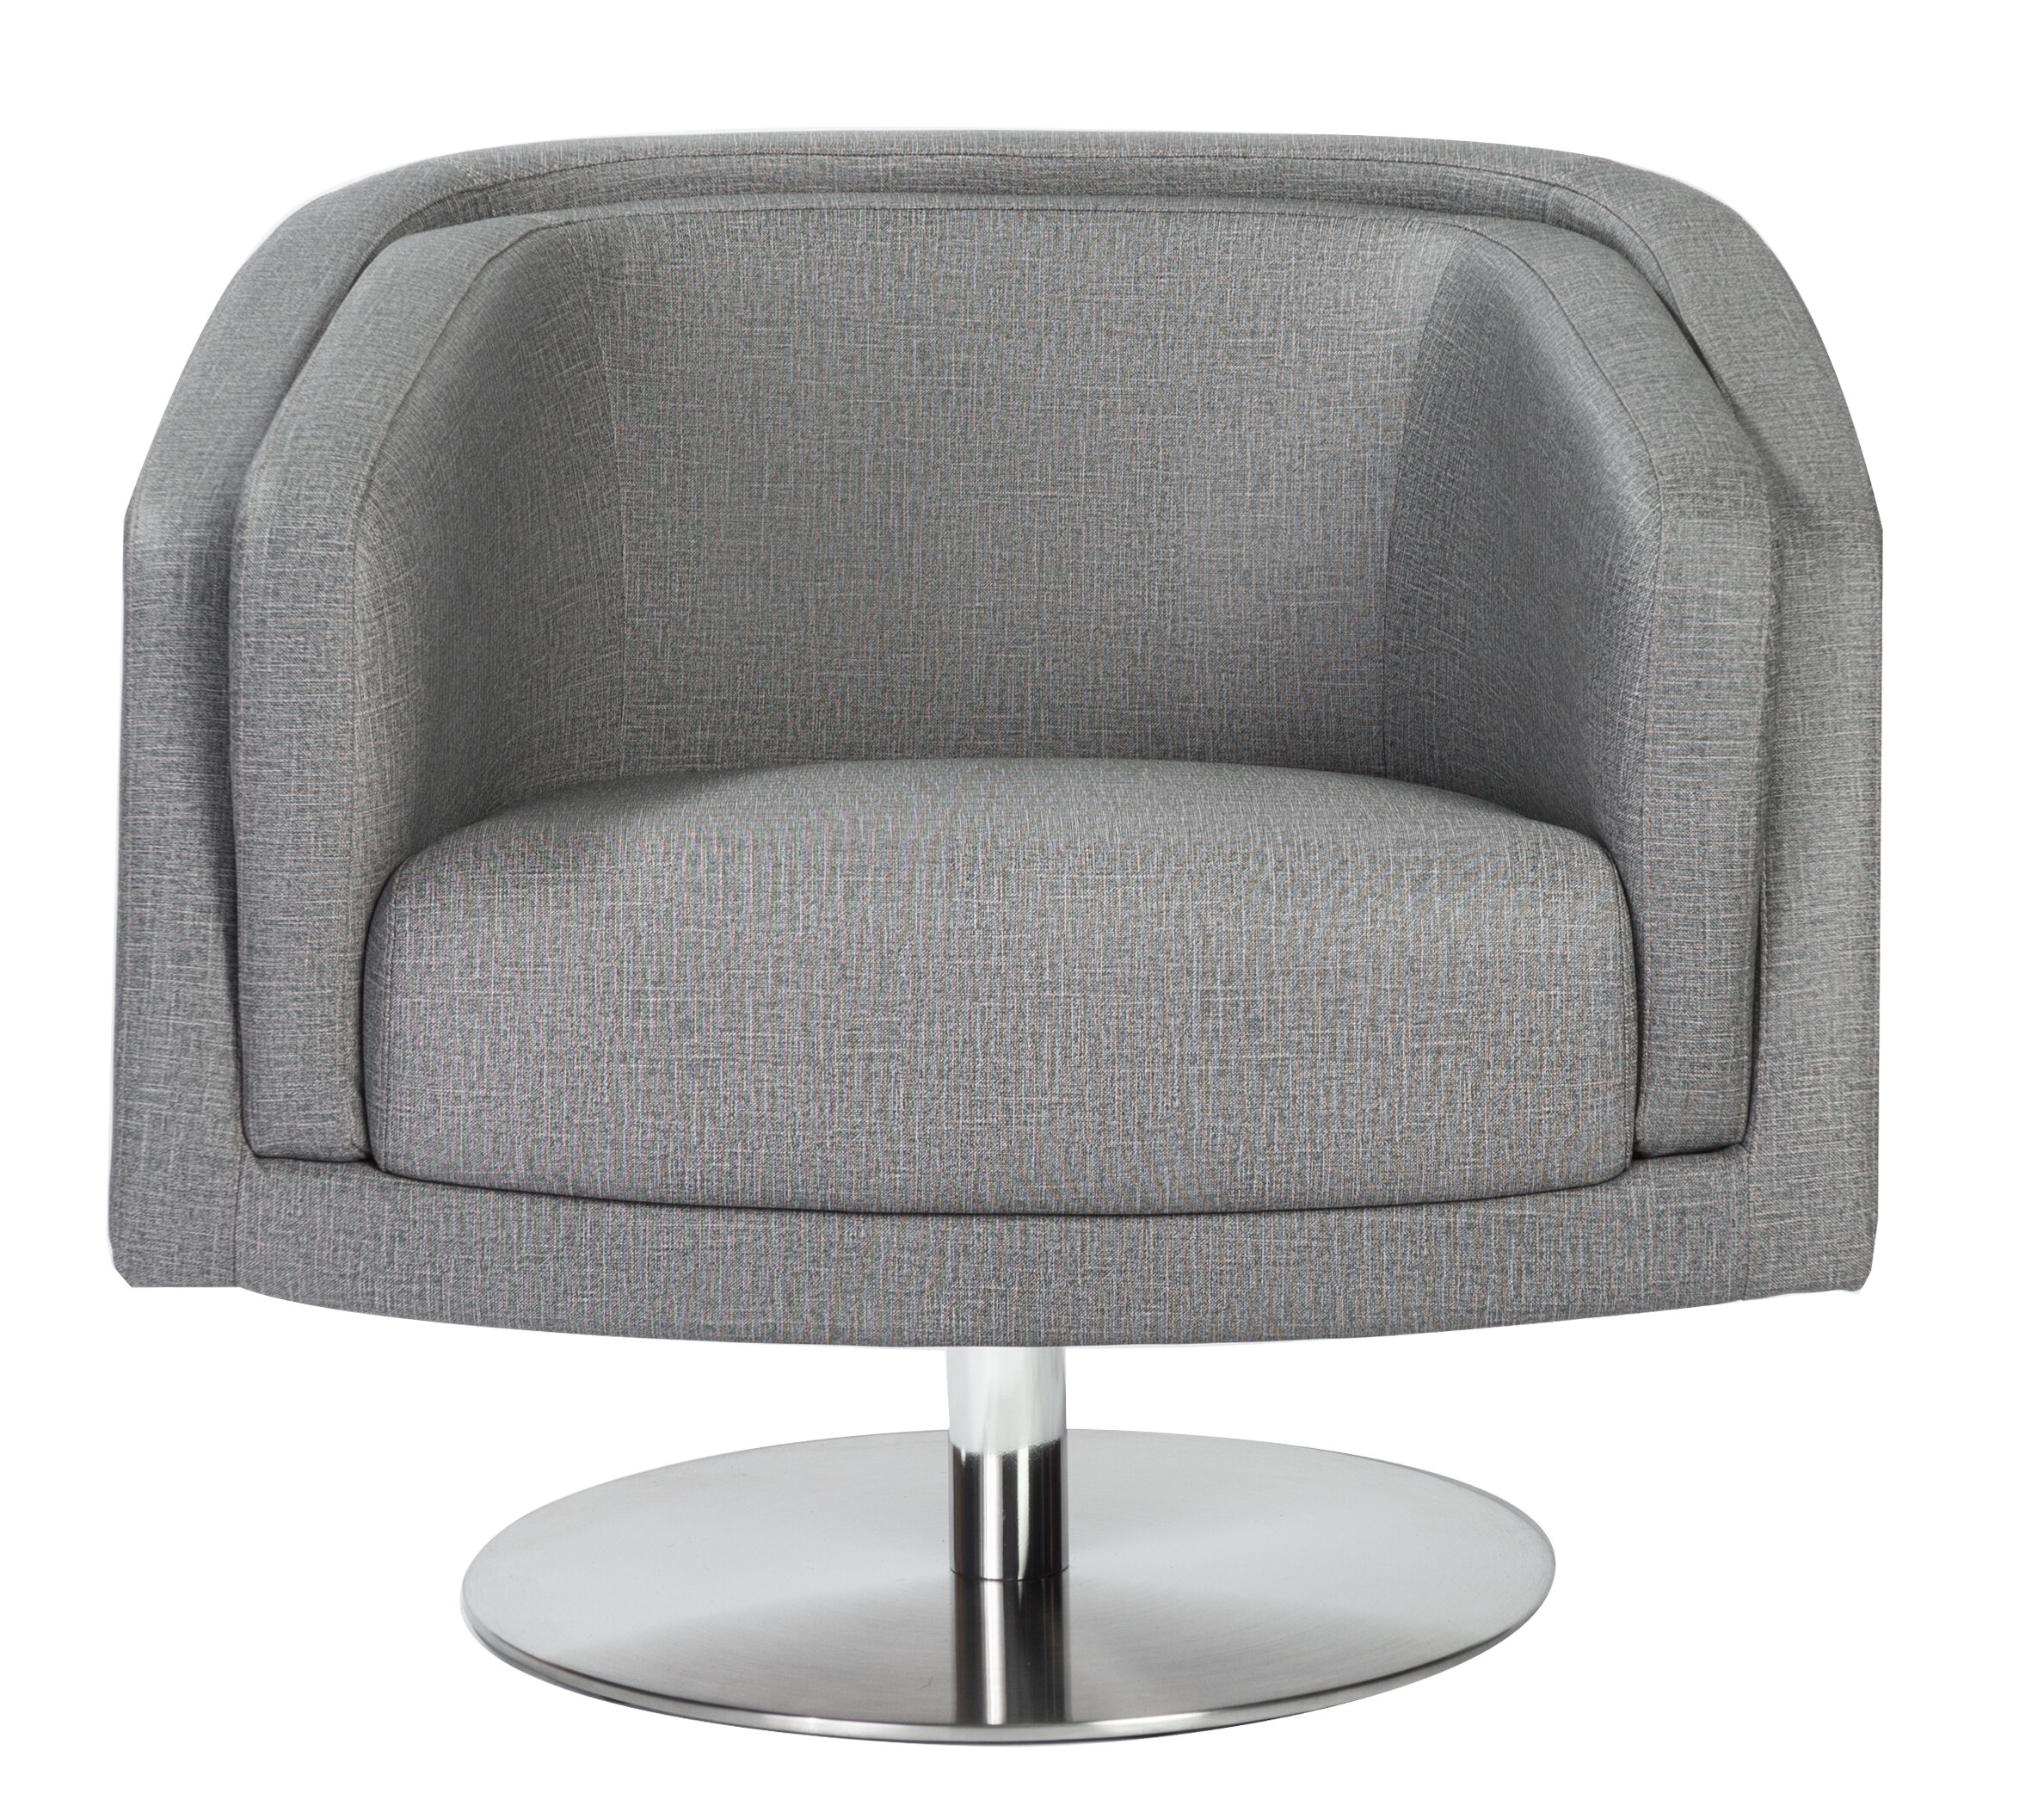 Admirable Orren Ellis Orofino Swivel Lounge Chair Wayfair Theyellowbook Wood Chair Design Ideas Theyellowbookinfo